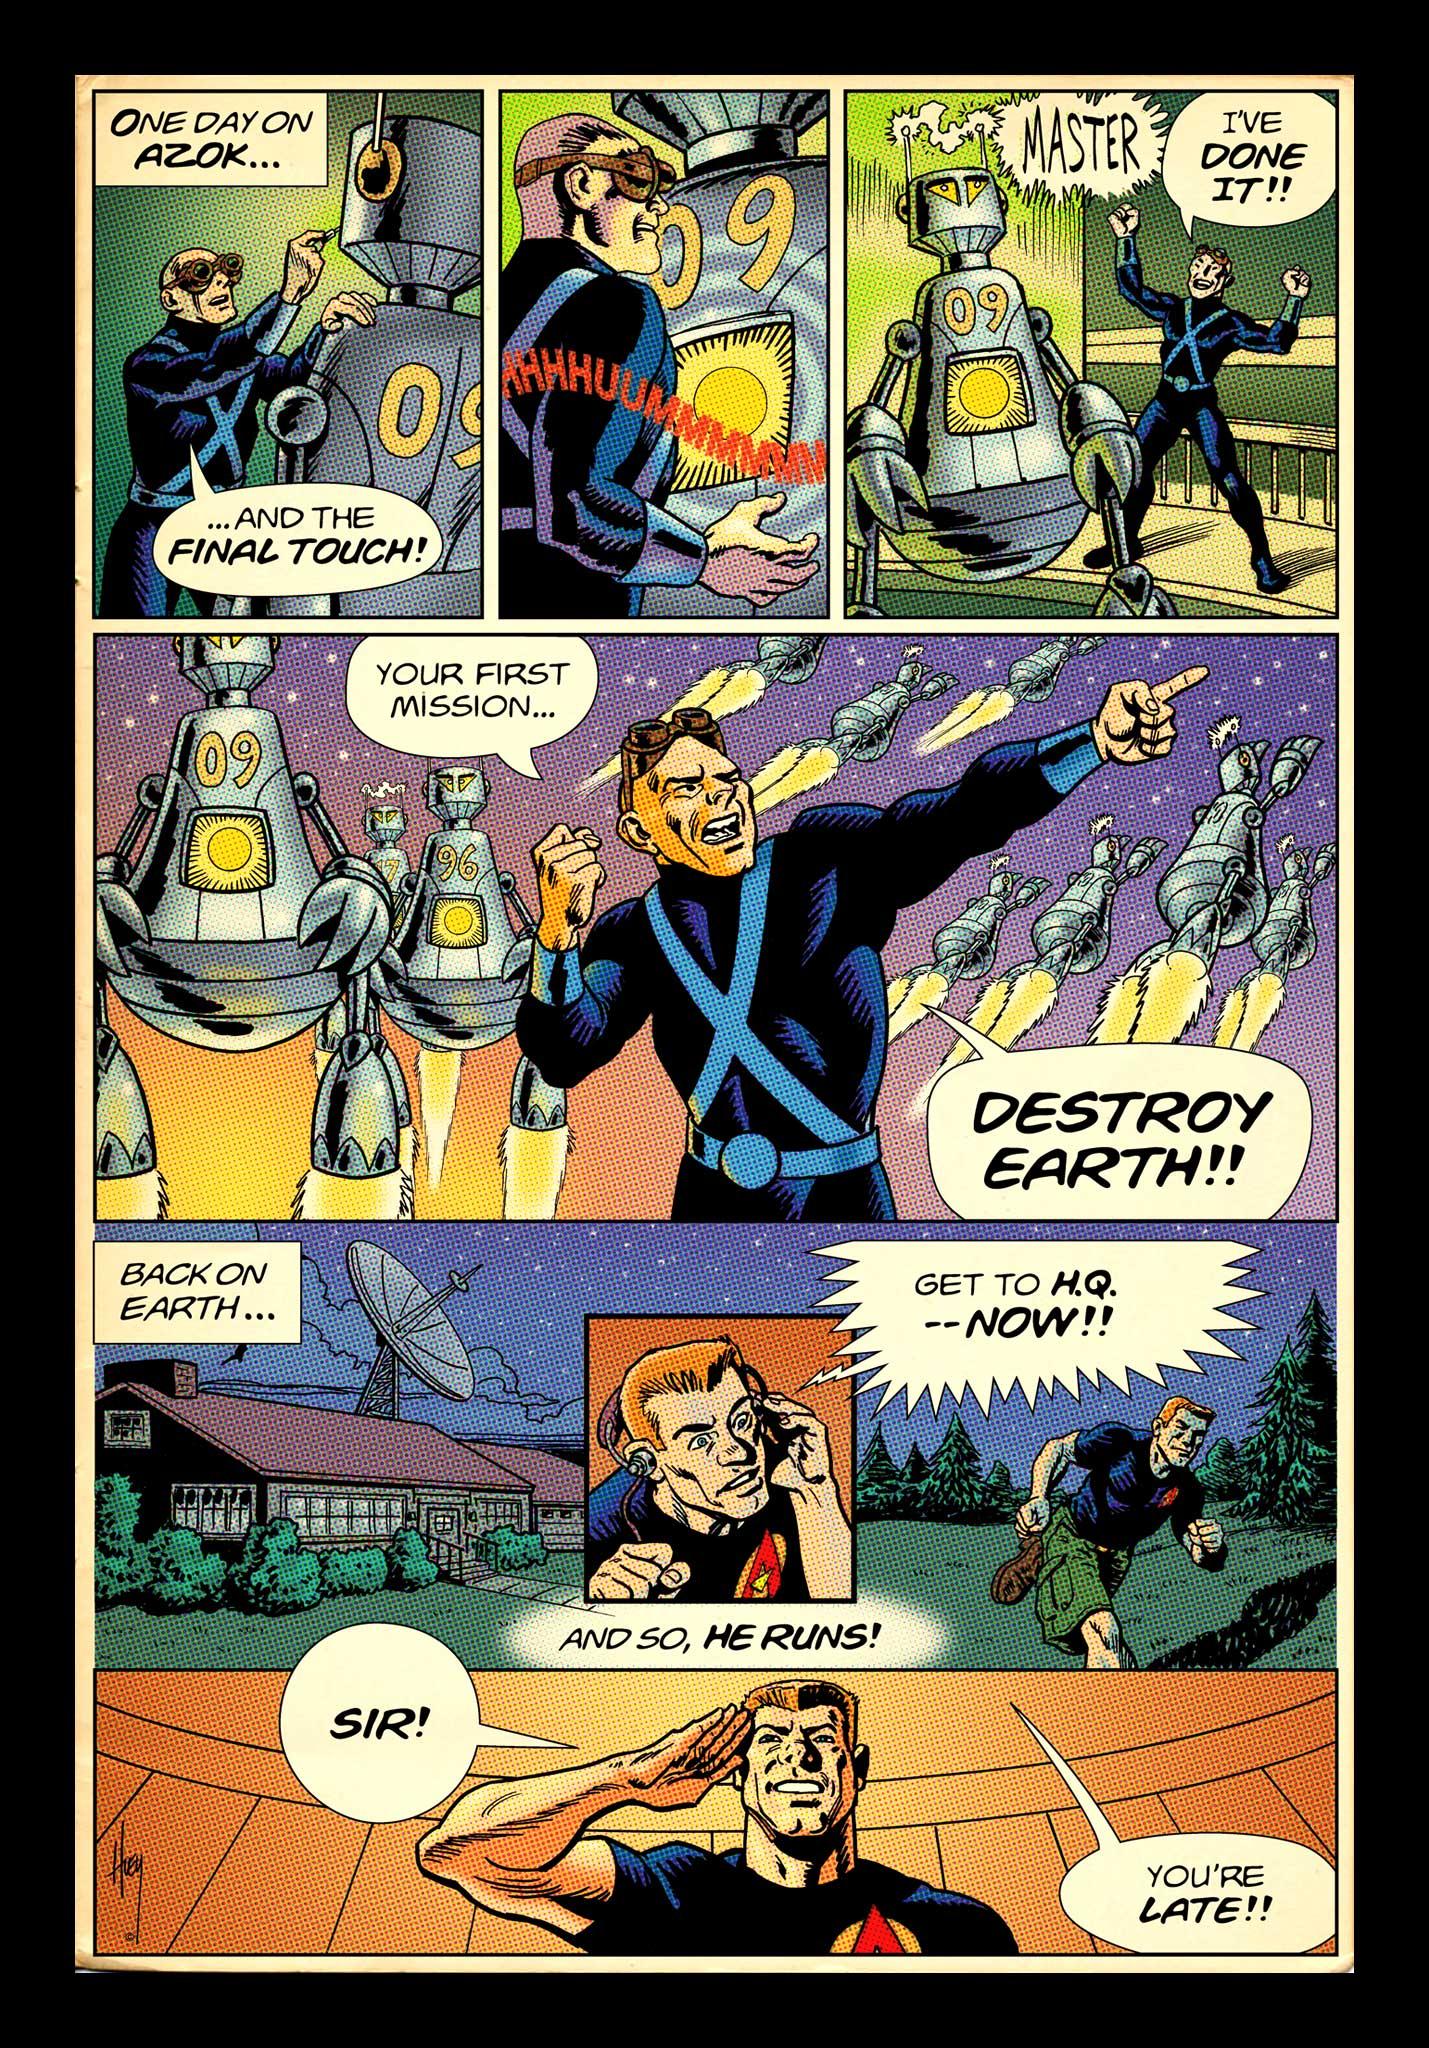 KH3401B-robot-alien-invasion-comic